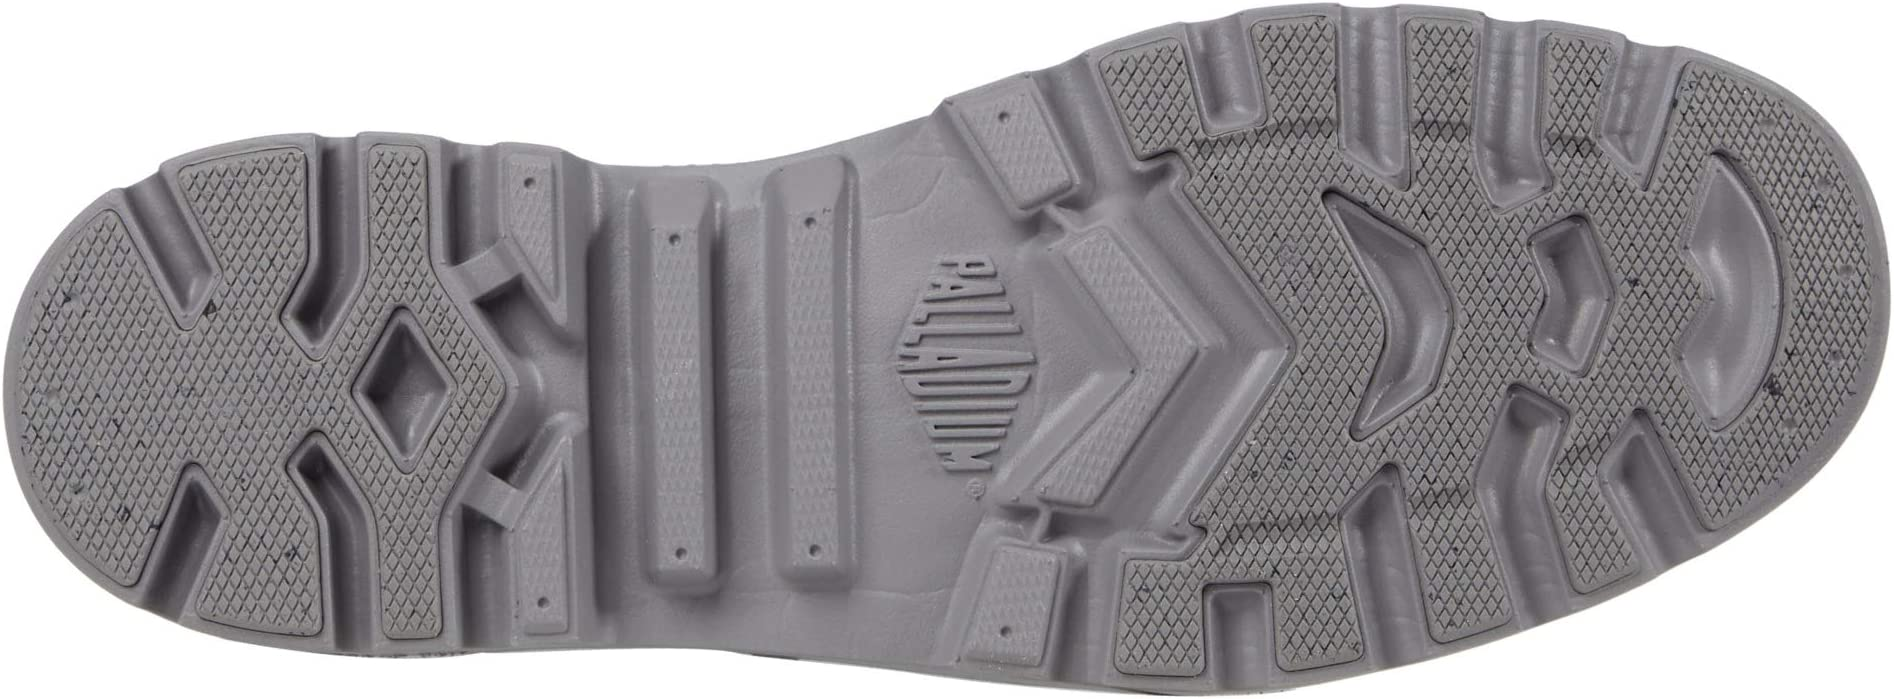 Palladium Pampa Lite+ Recycle Wp+   Women's shoes   2020 Newest